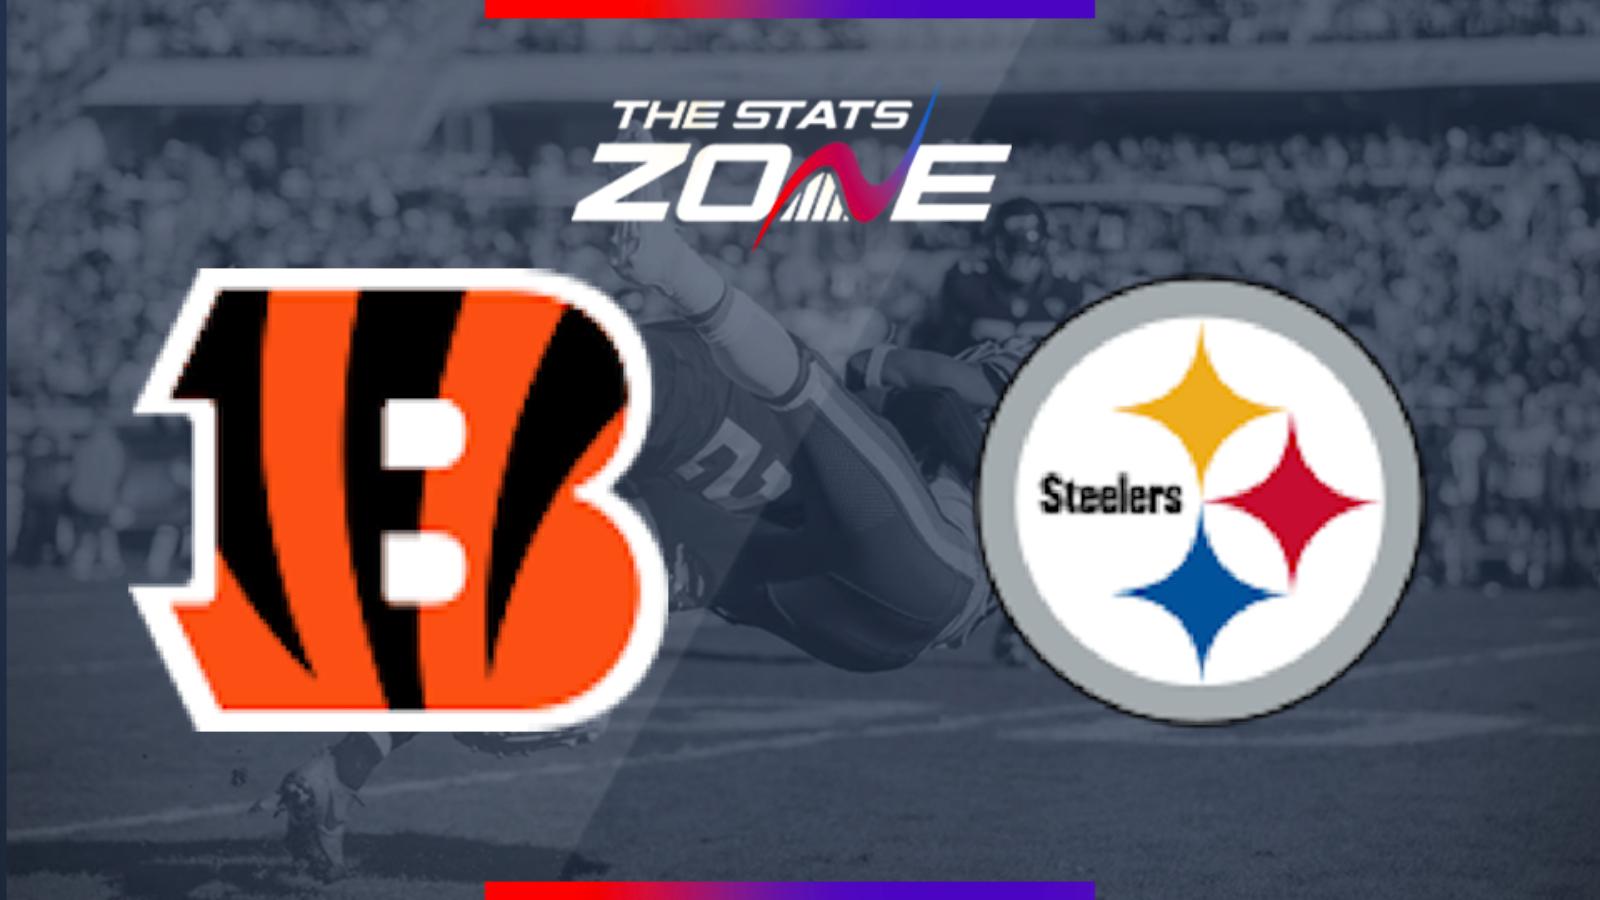 2019 Nfl Cincinnati Bengals Pittsburgh Steelers Preview